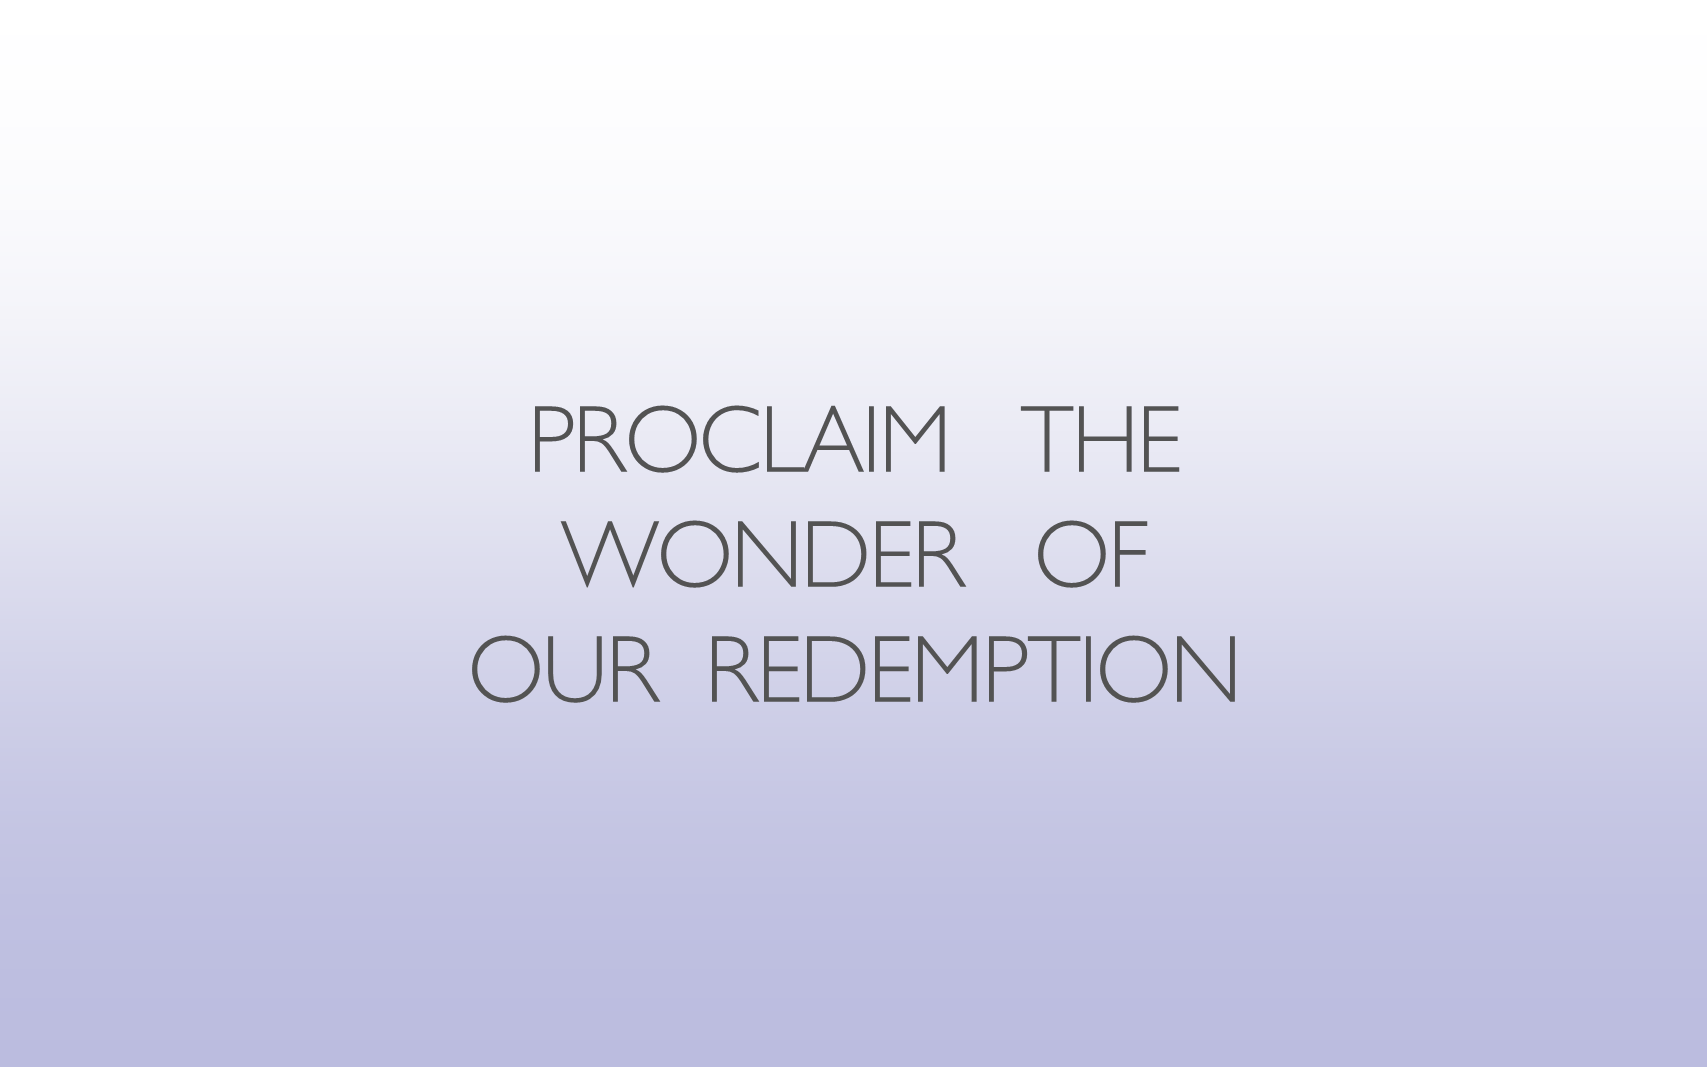 WCC-03 - Proclaiming Christ's Cross Regularly (14)